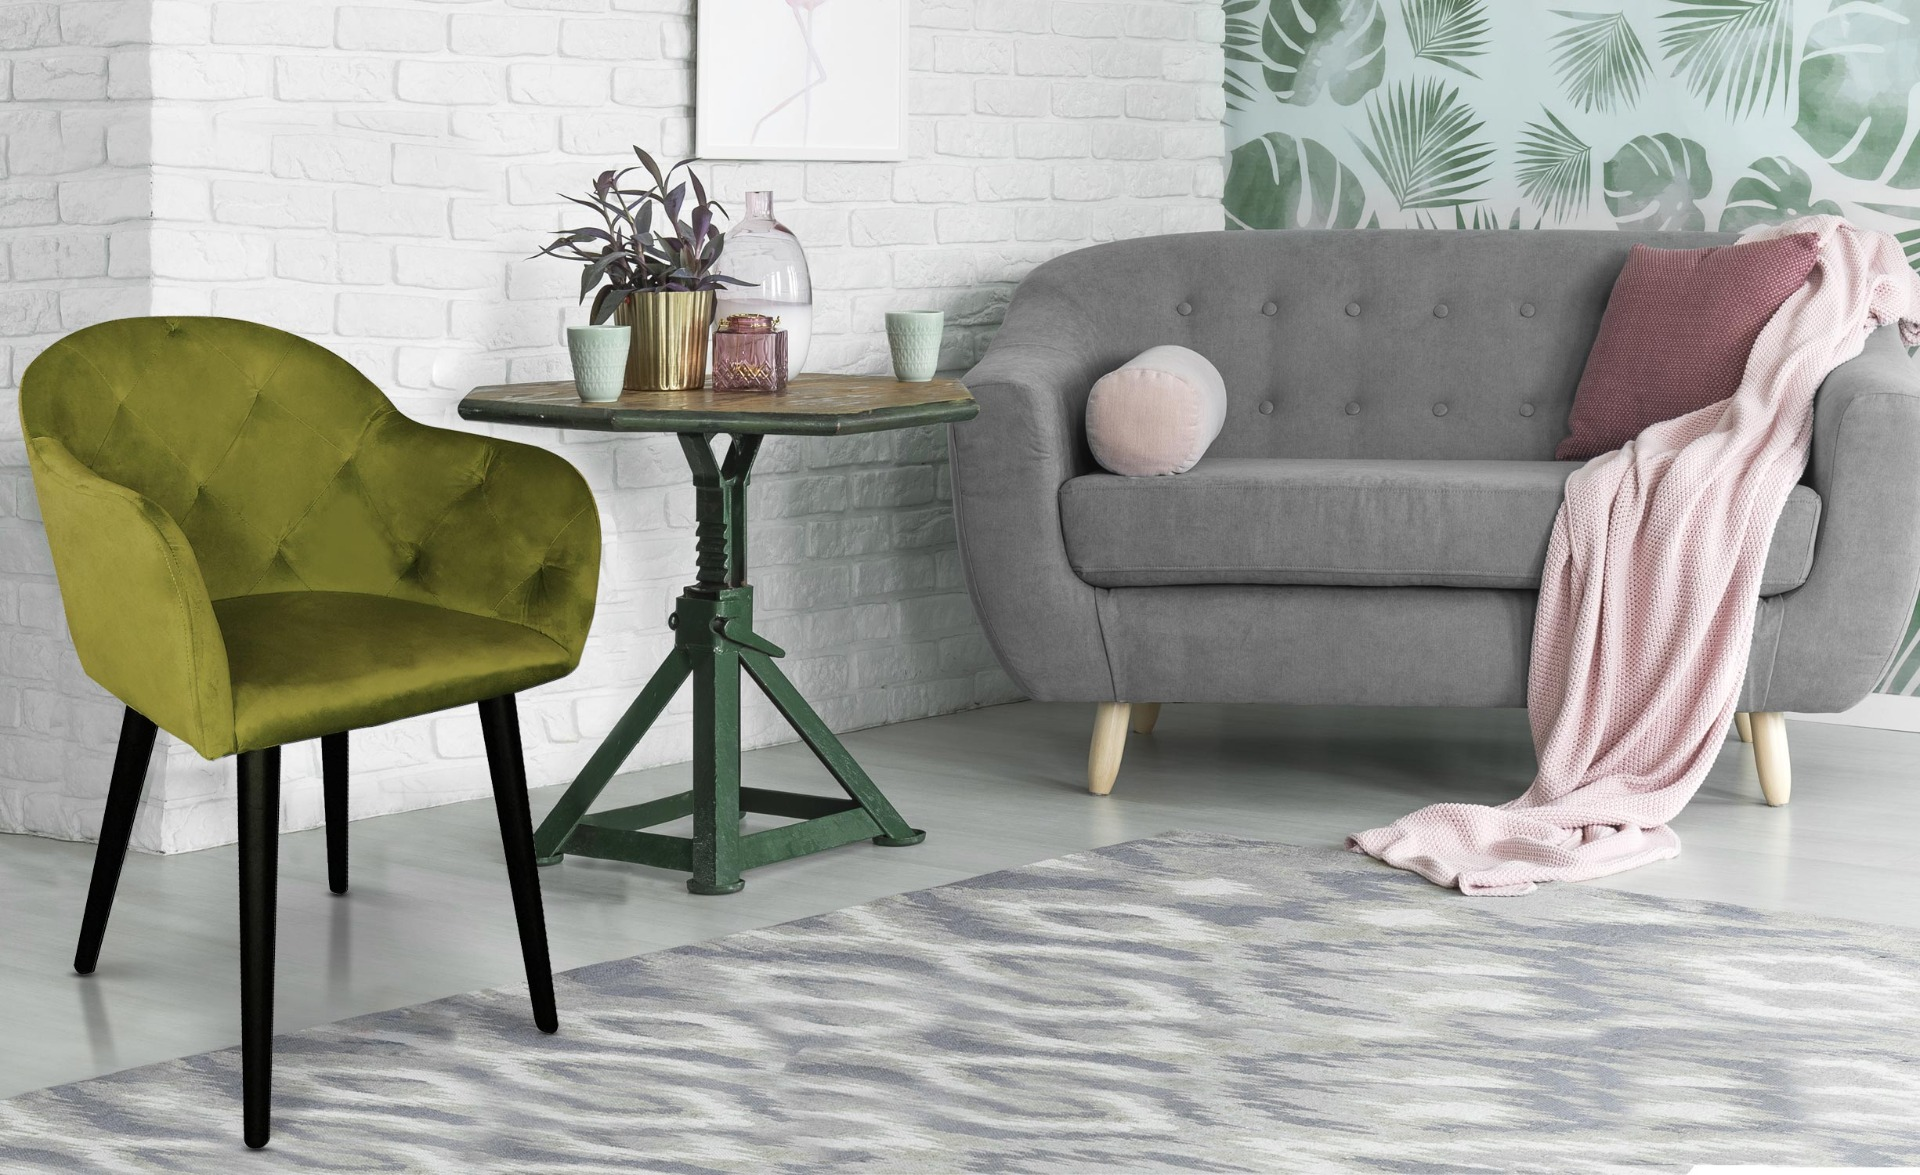 Honorine stoel / fauteuil kaki fluweel